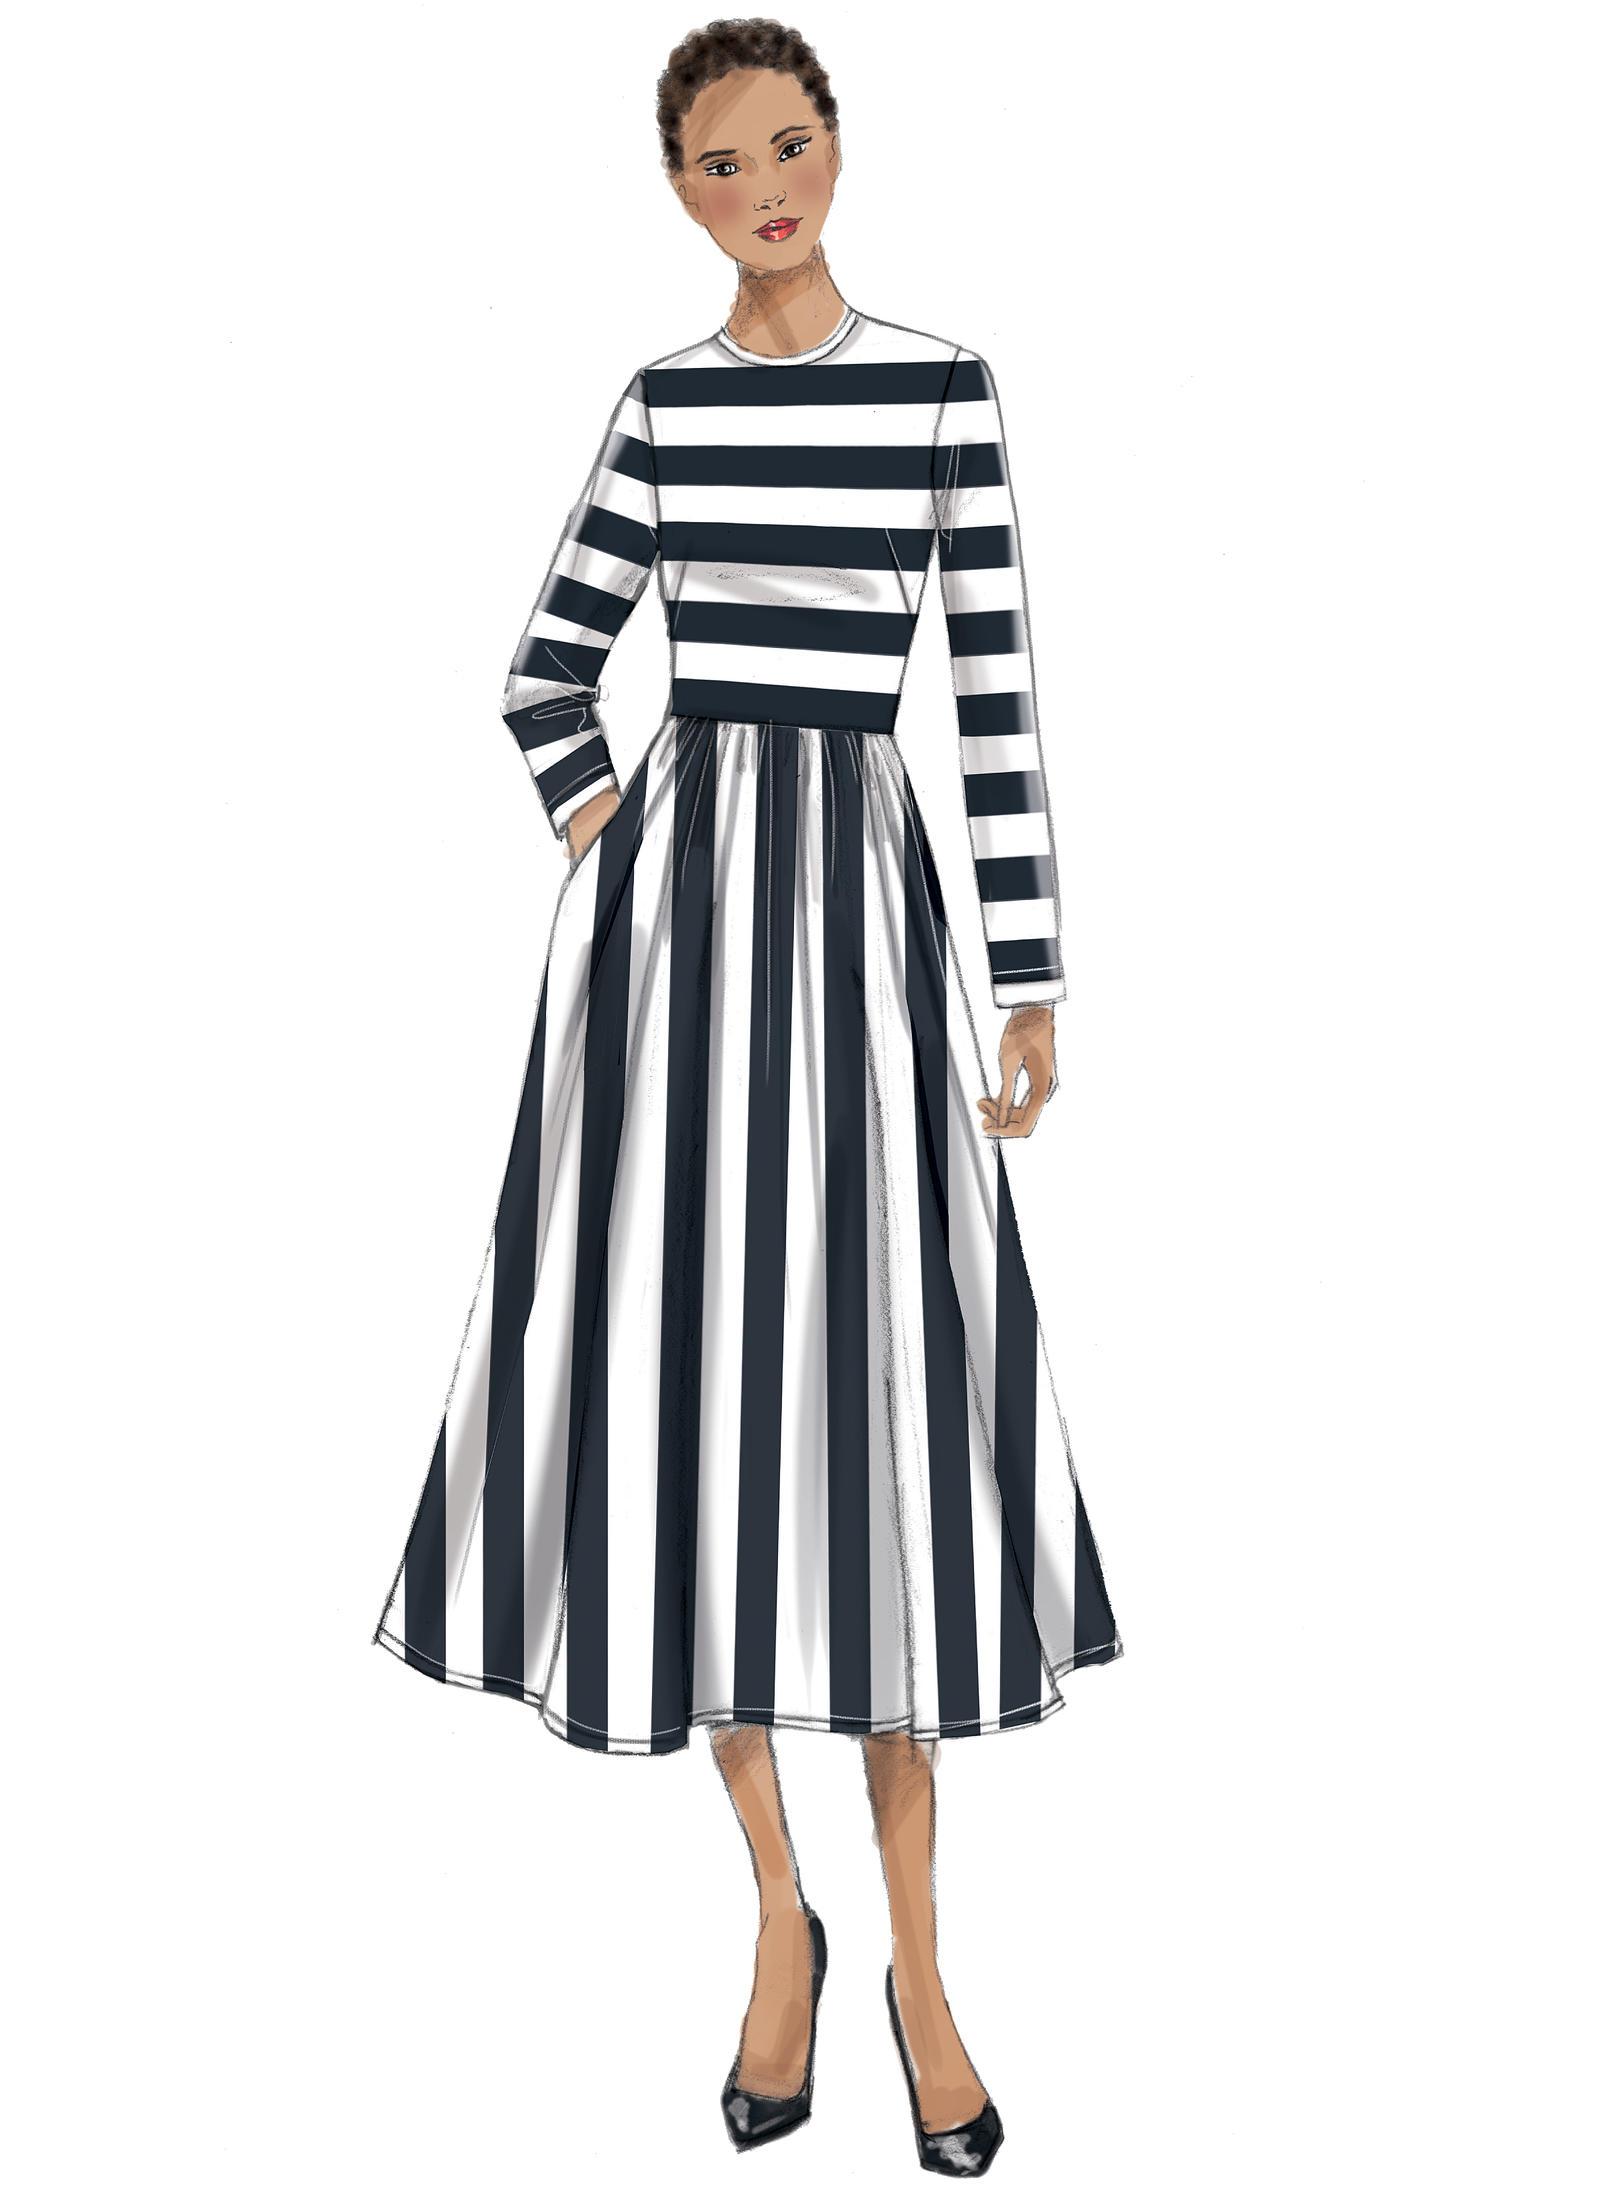 Vogue Dresses